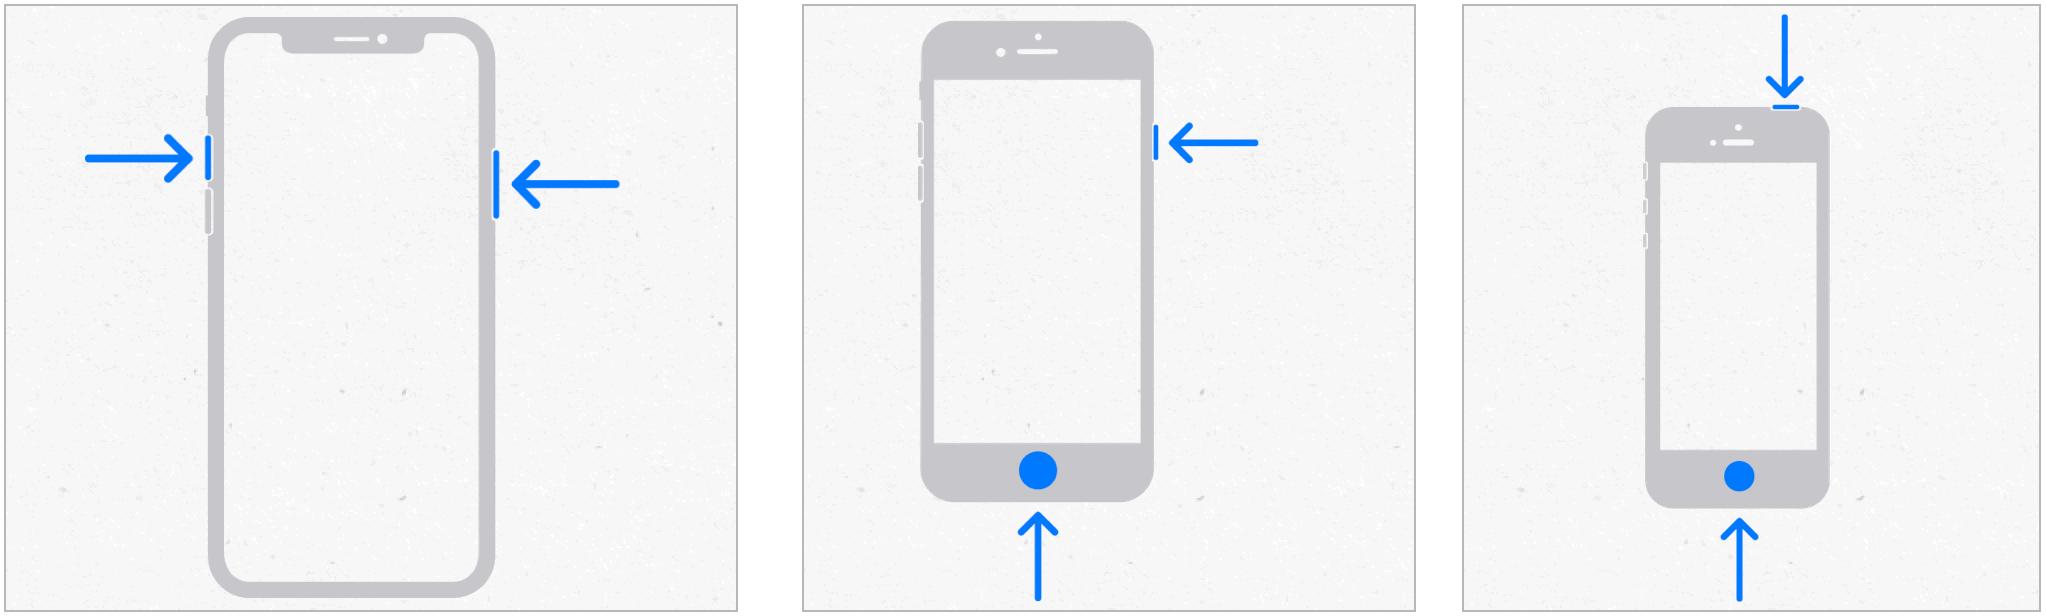 iPhone create screenshots